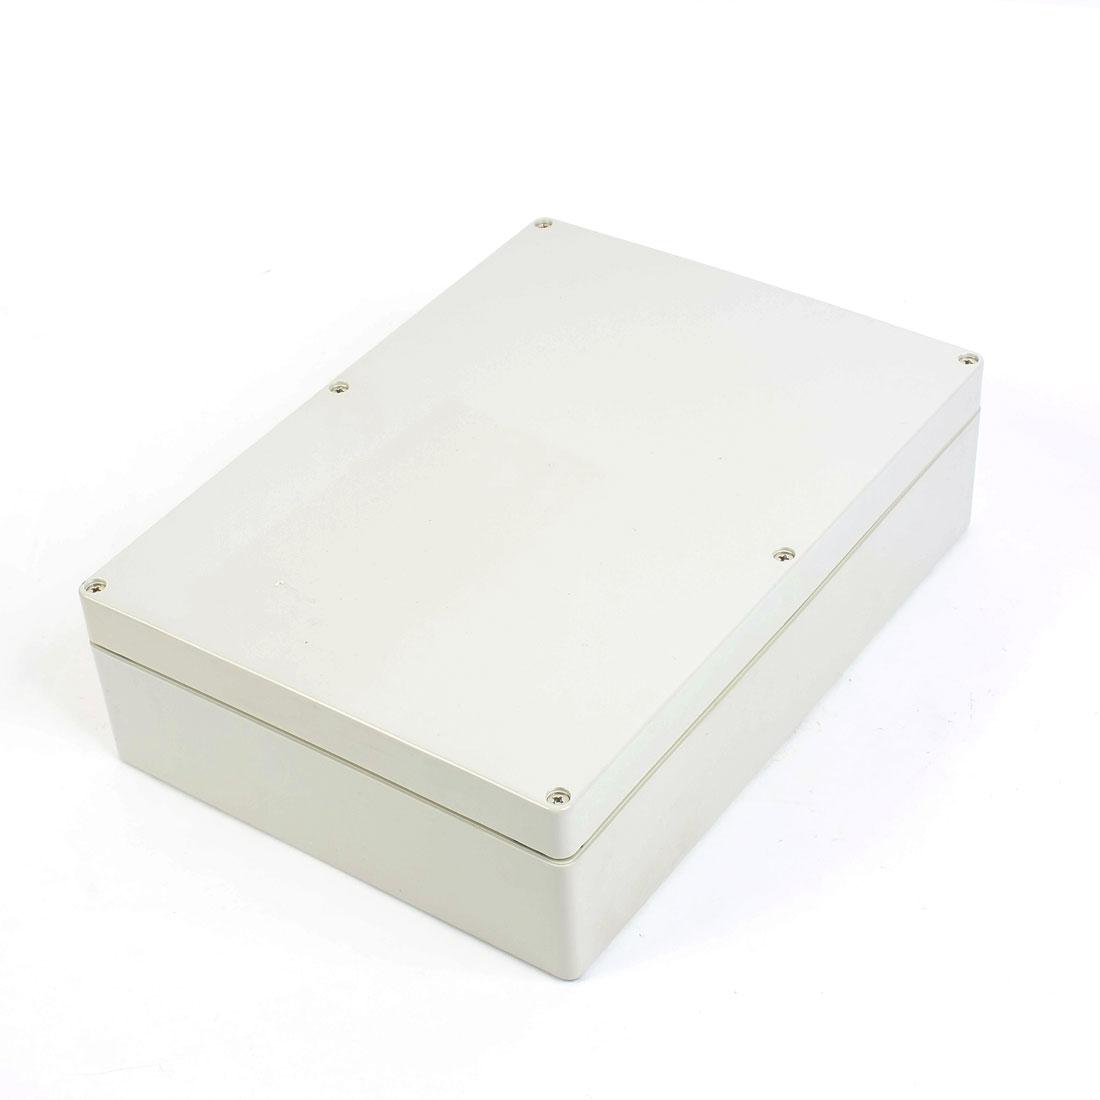 290mmx210mmx80mm Plastic Enclosure Case Power Junction Box